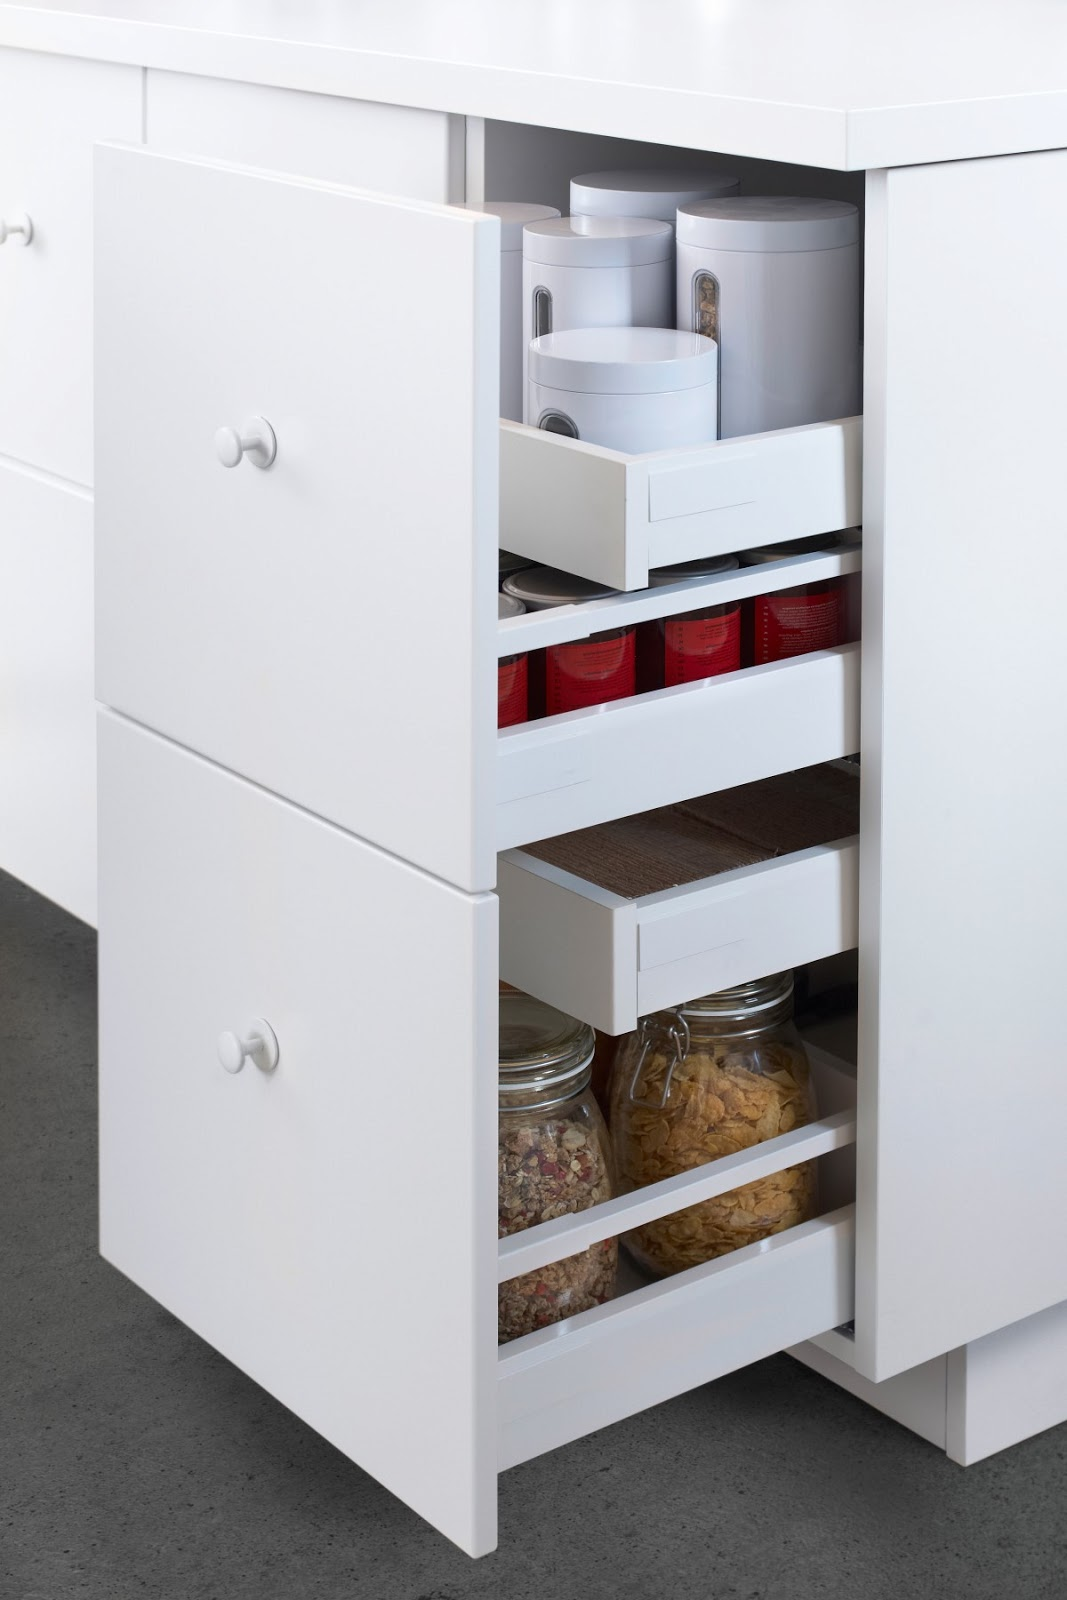 Nytt Kok Ikea : nytt kok ikea  vi hade ju tonkt kopa nytt kok redan for nogon